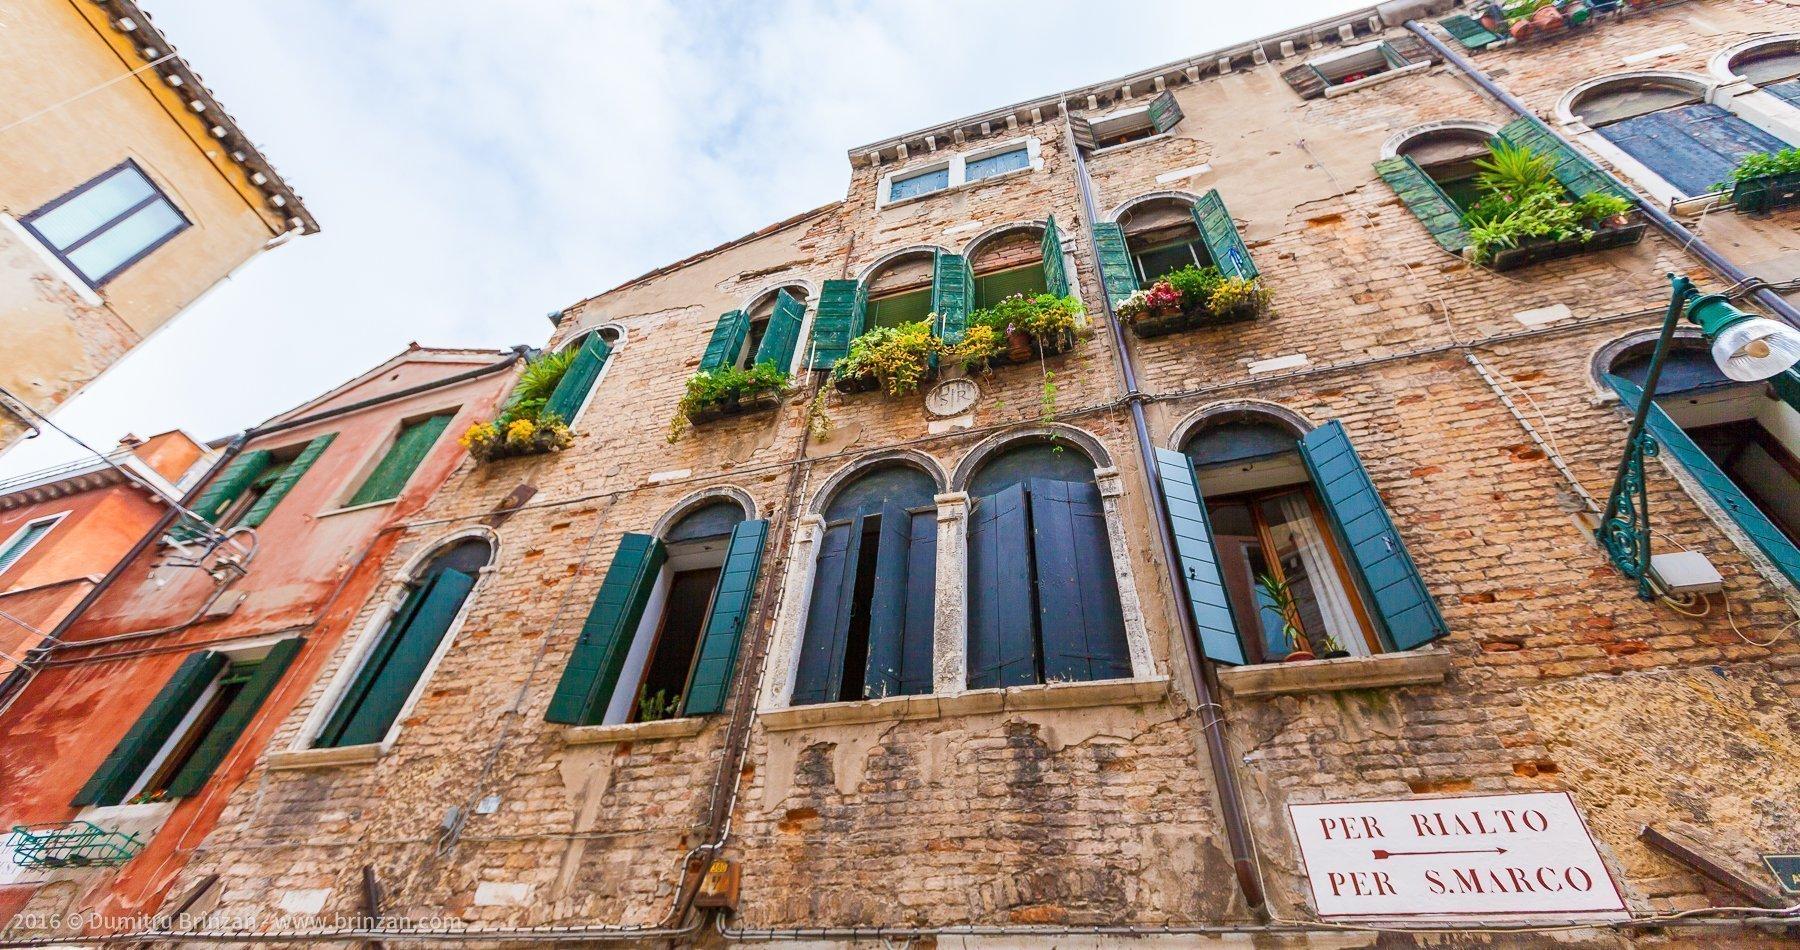 And beautiful windows.